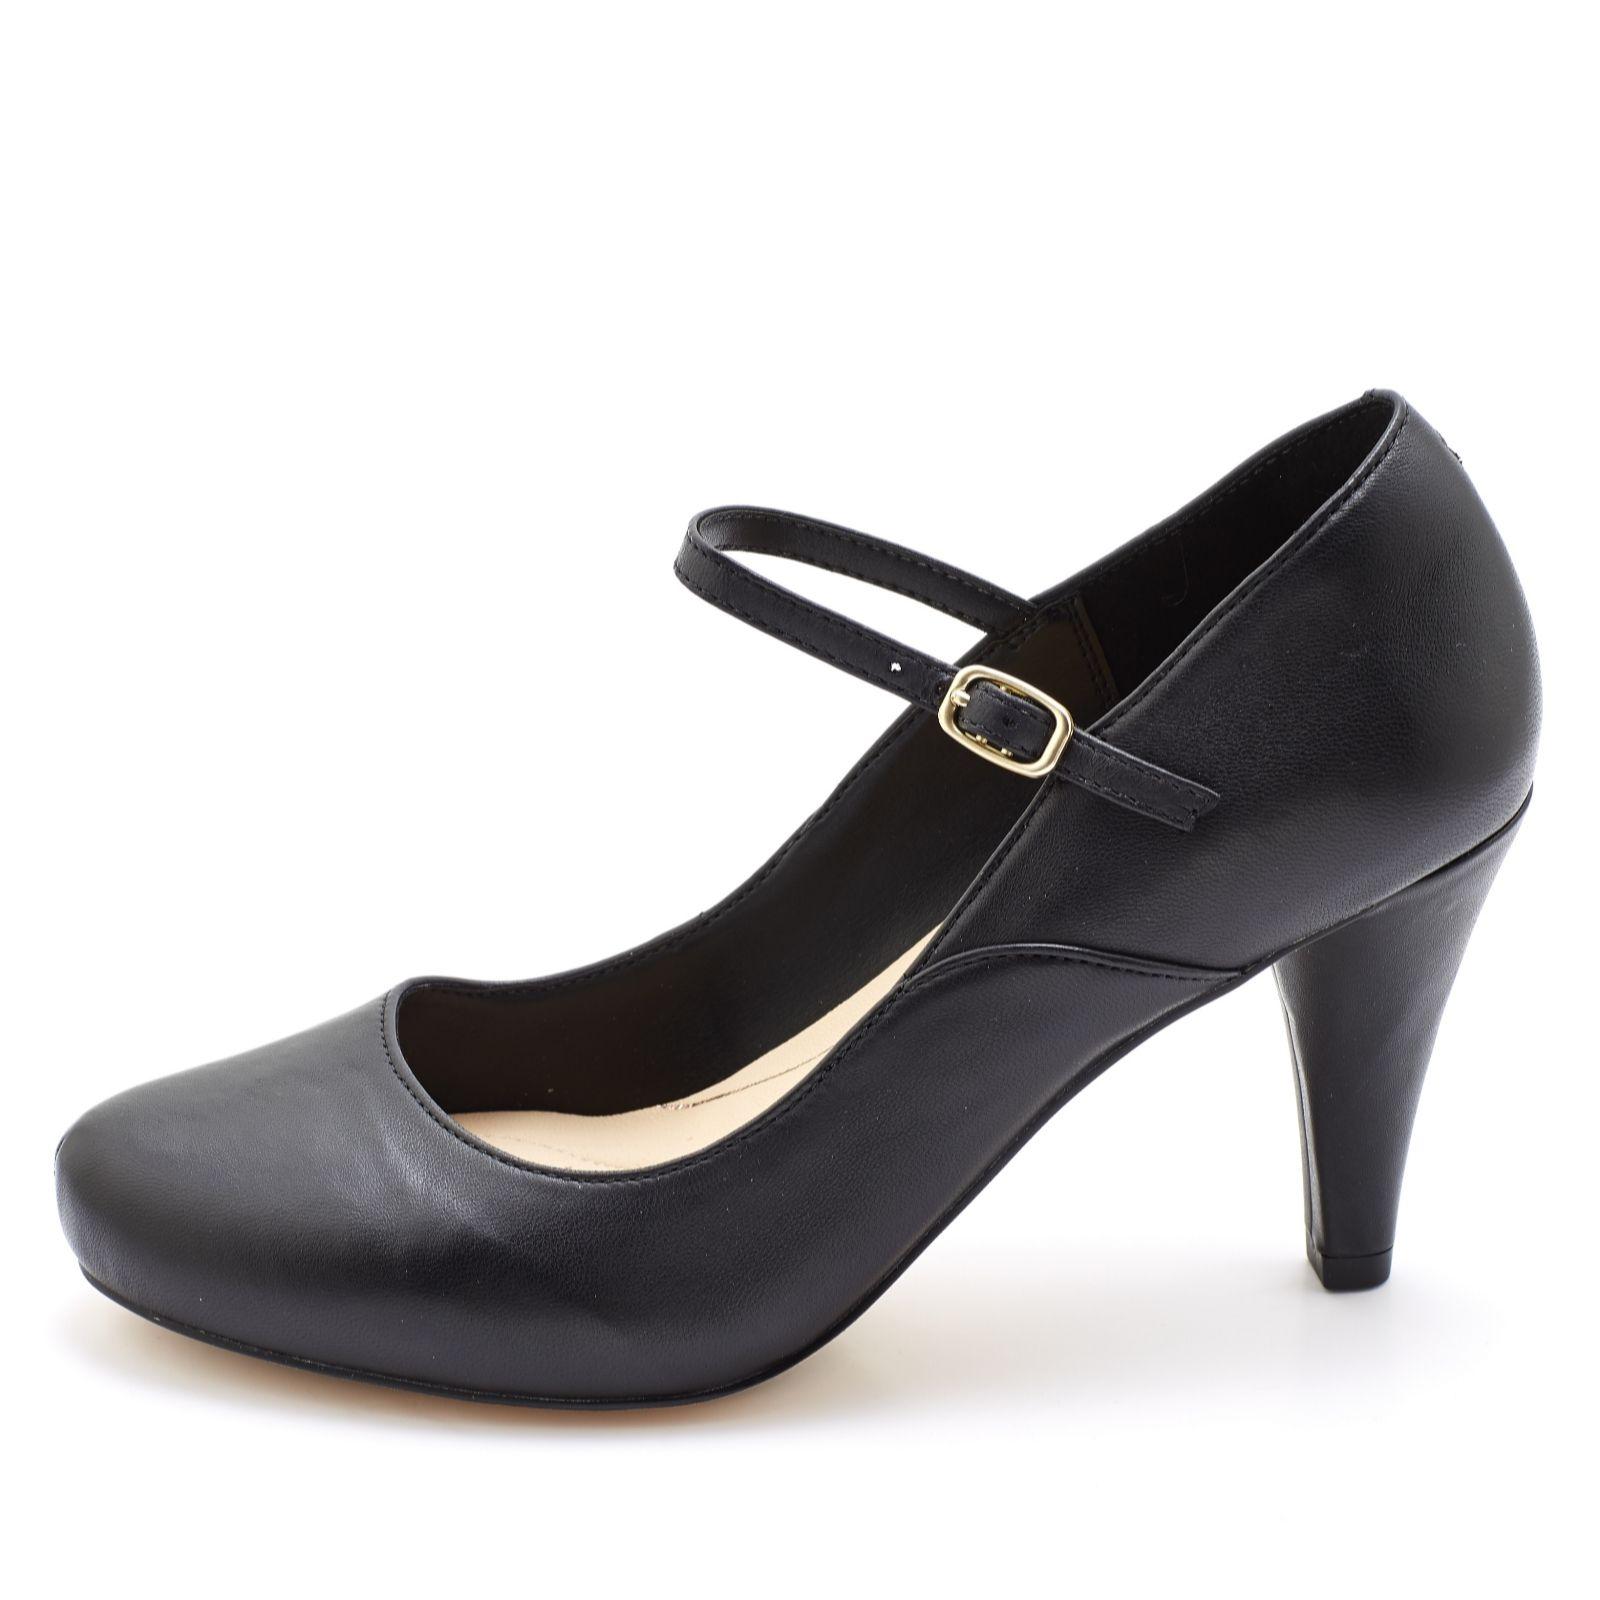 1094631d0be662 Clarks Dalia Lily Court Shoe Standard Fit - QVC UK